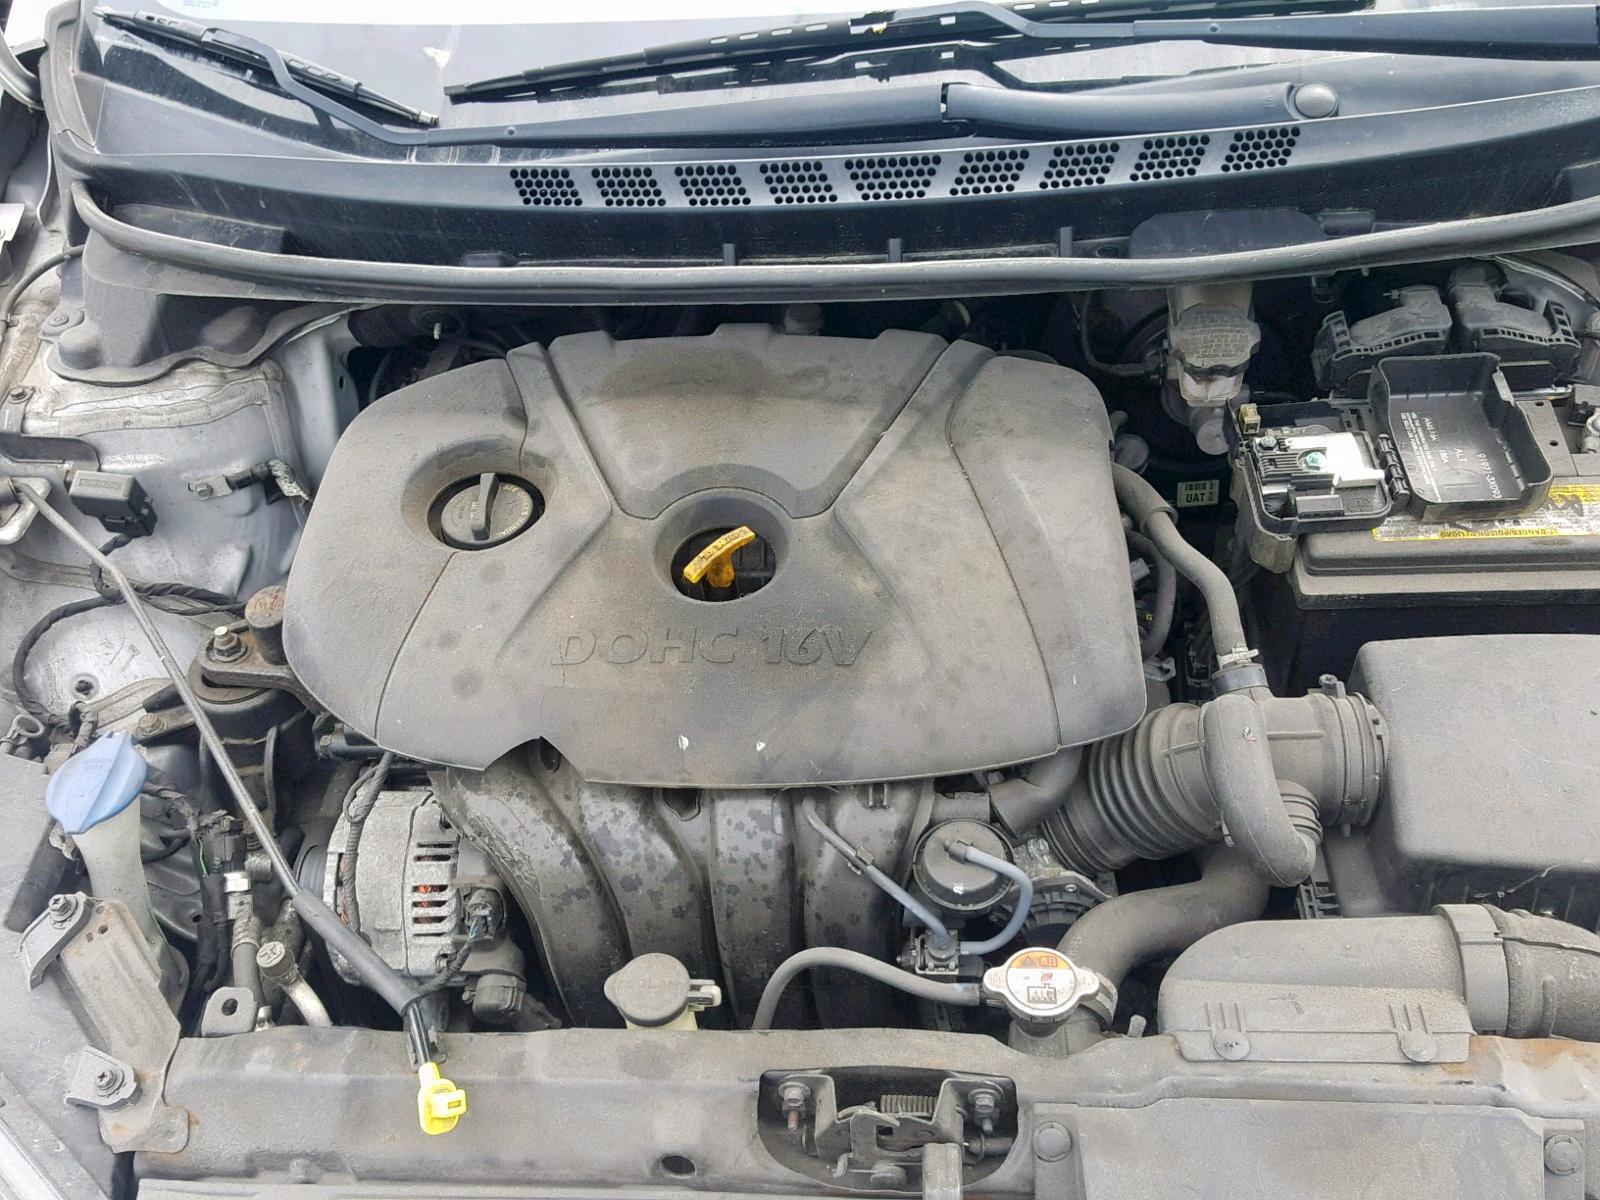 5NPDH4AE0GH703333 - 2016 Hyundai Elantra Se 1.8L inside view